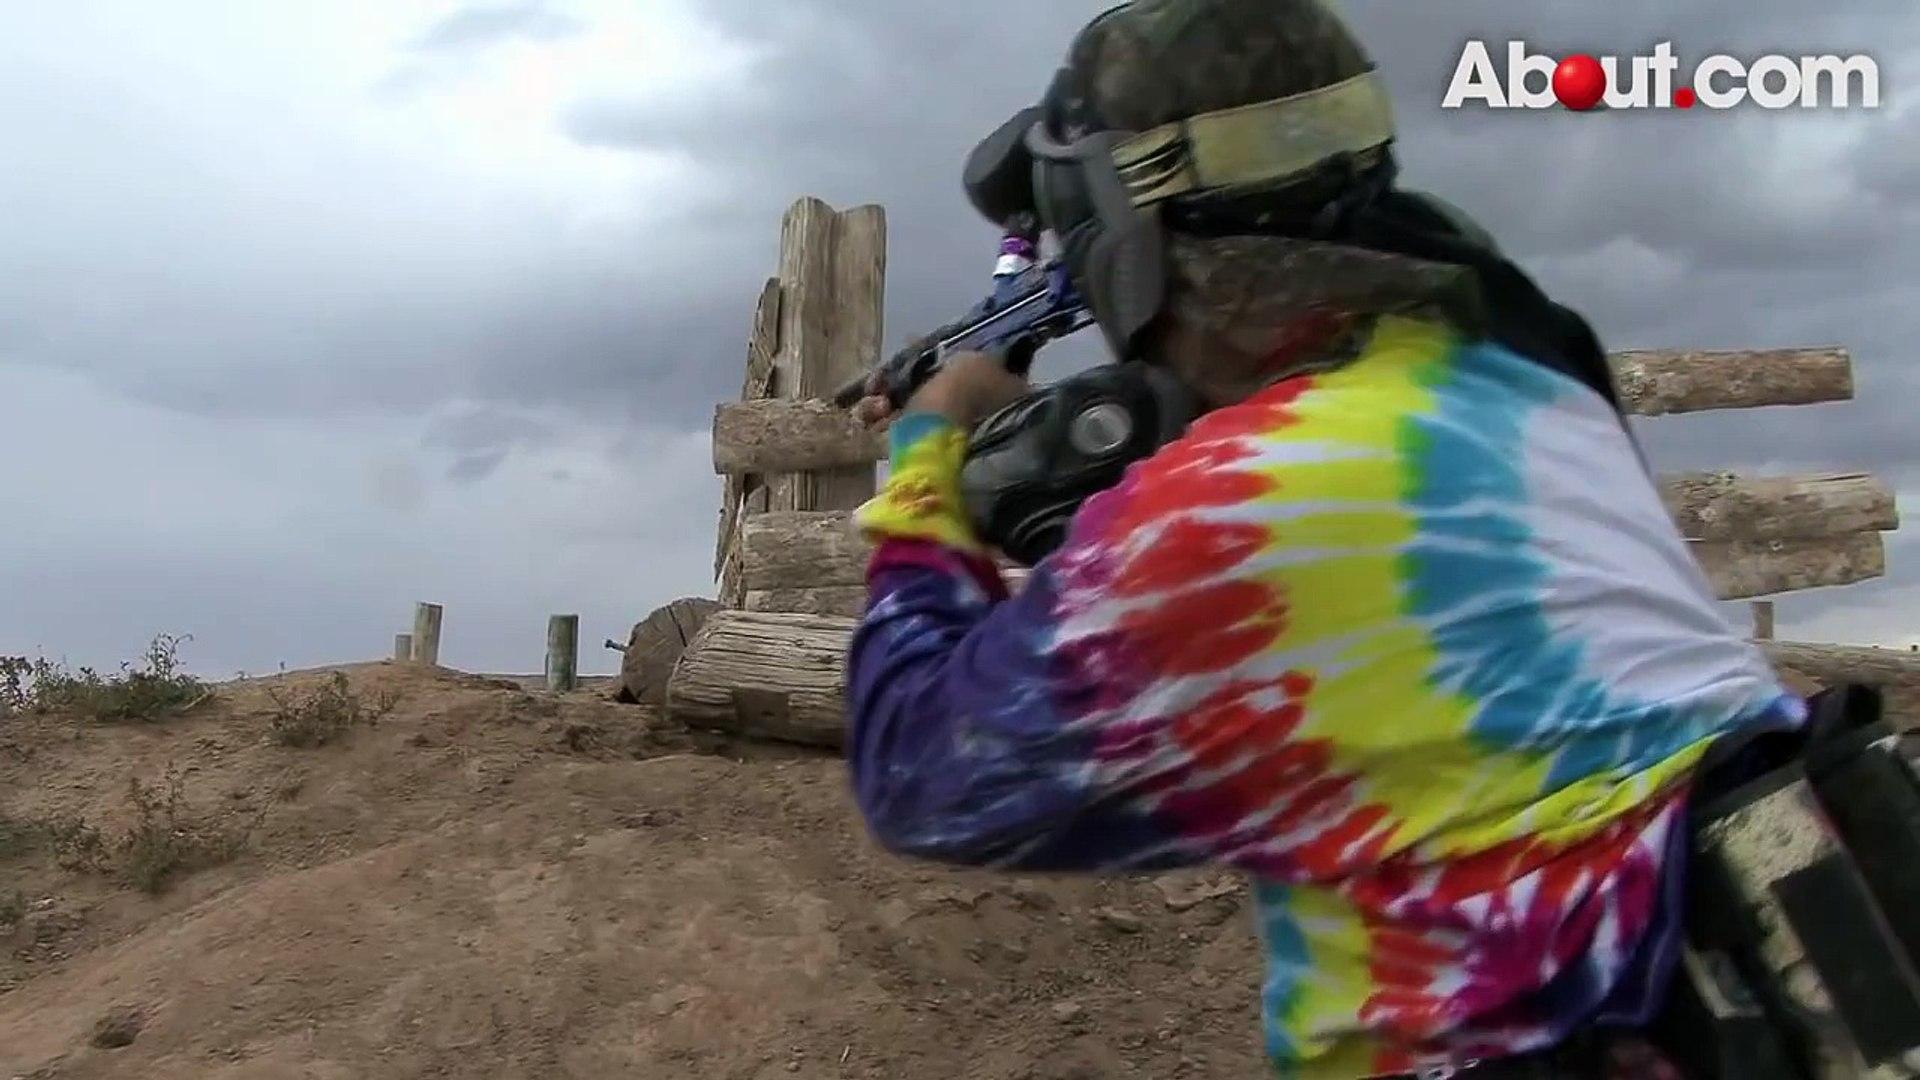 Electronic Vs Mechanical Paintball Guns Video Dailymotion